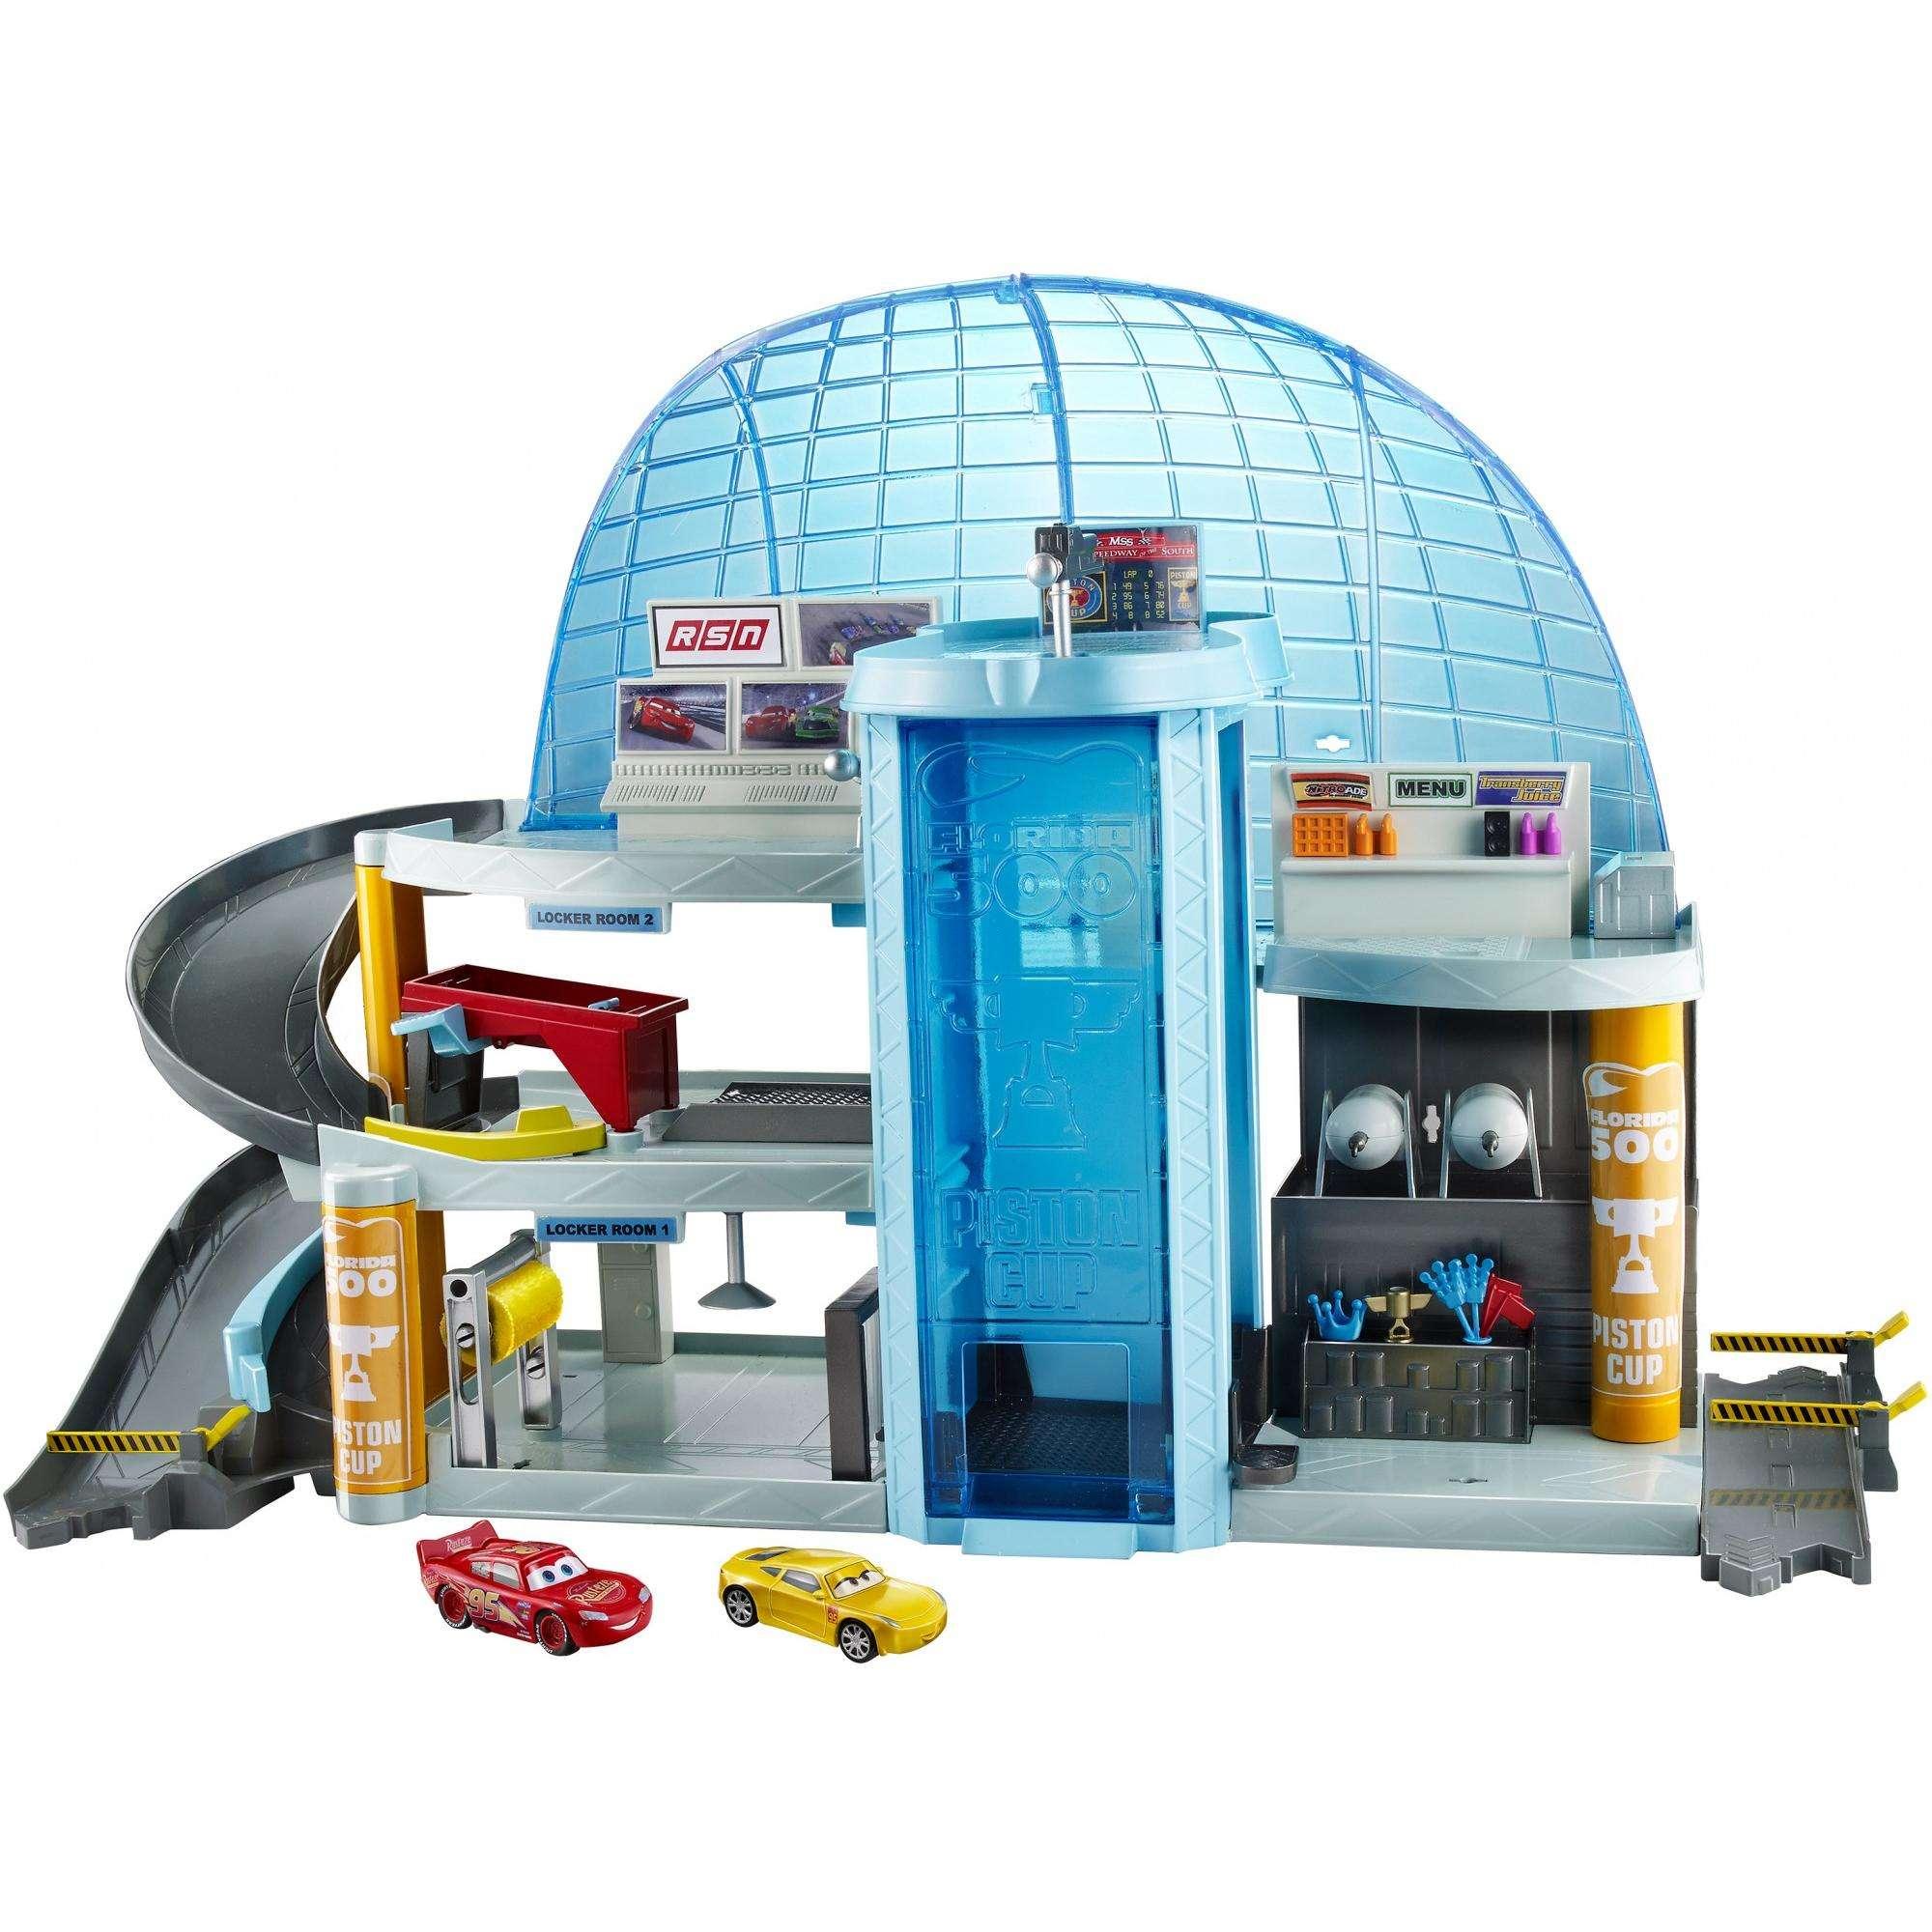 Disney/Pixar Cars 3 Florida Speedway Mega Garage Play Set